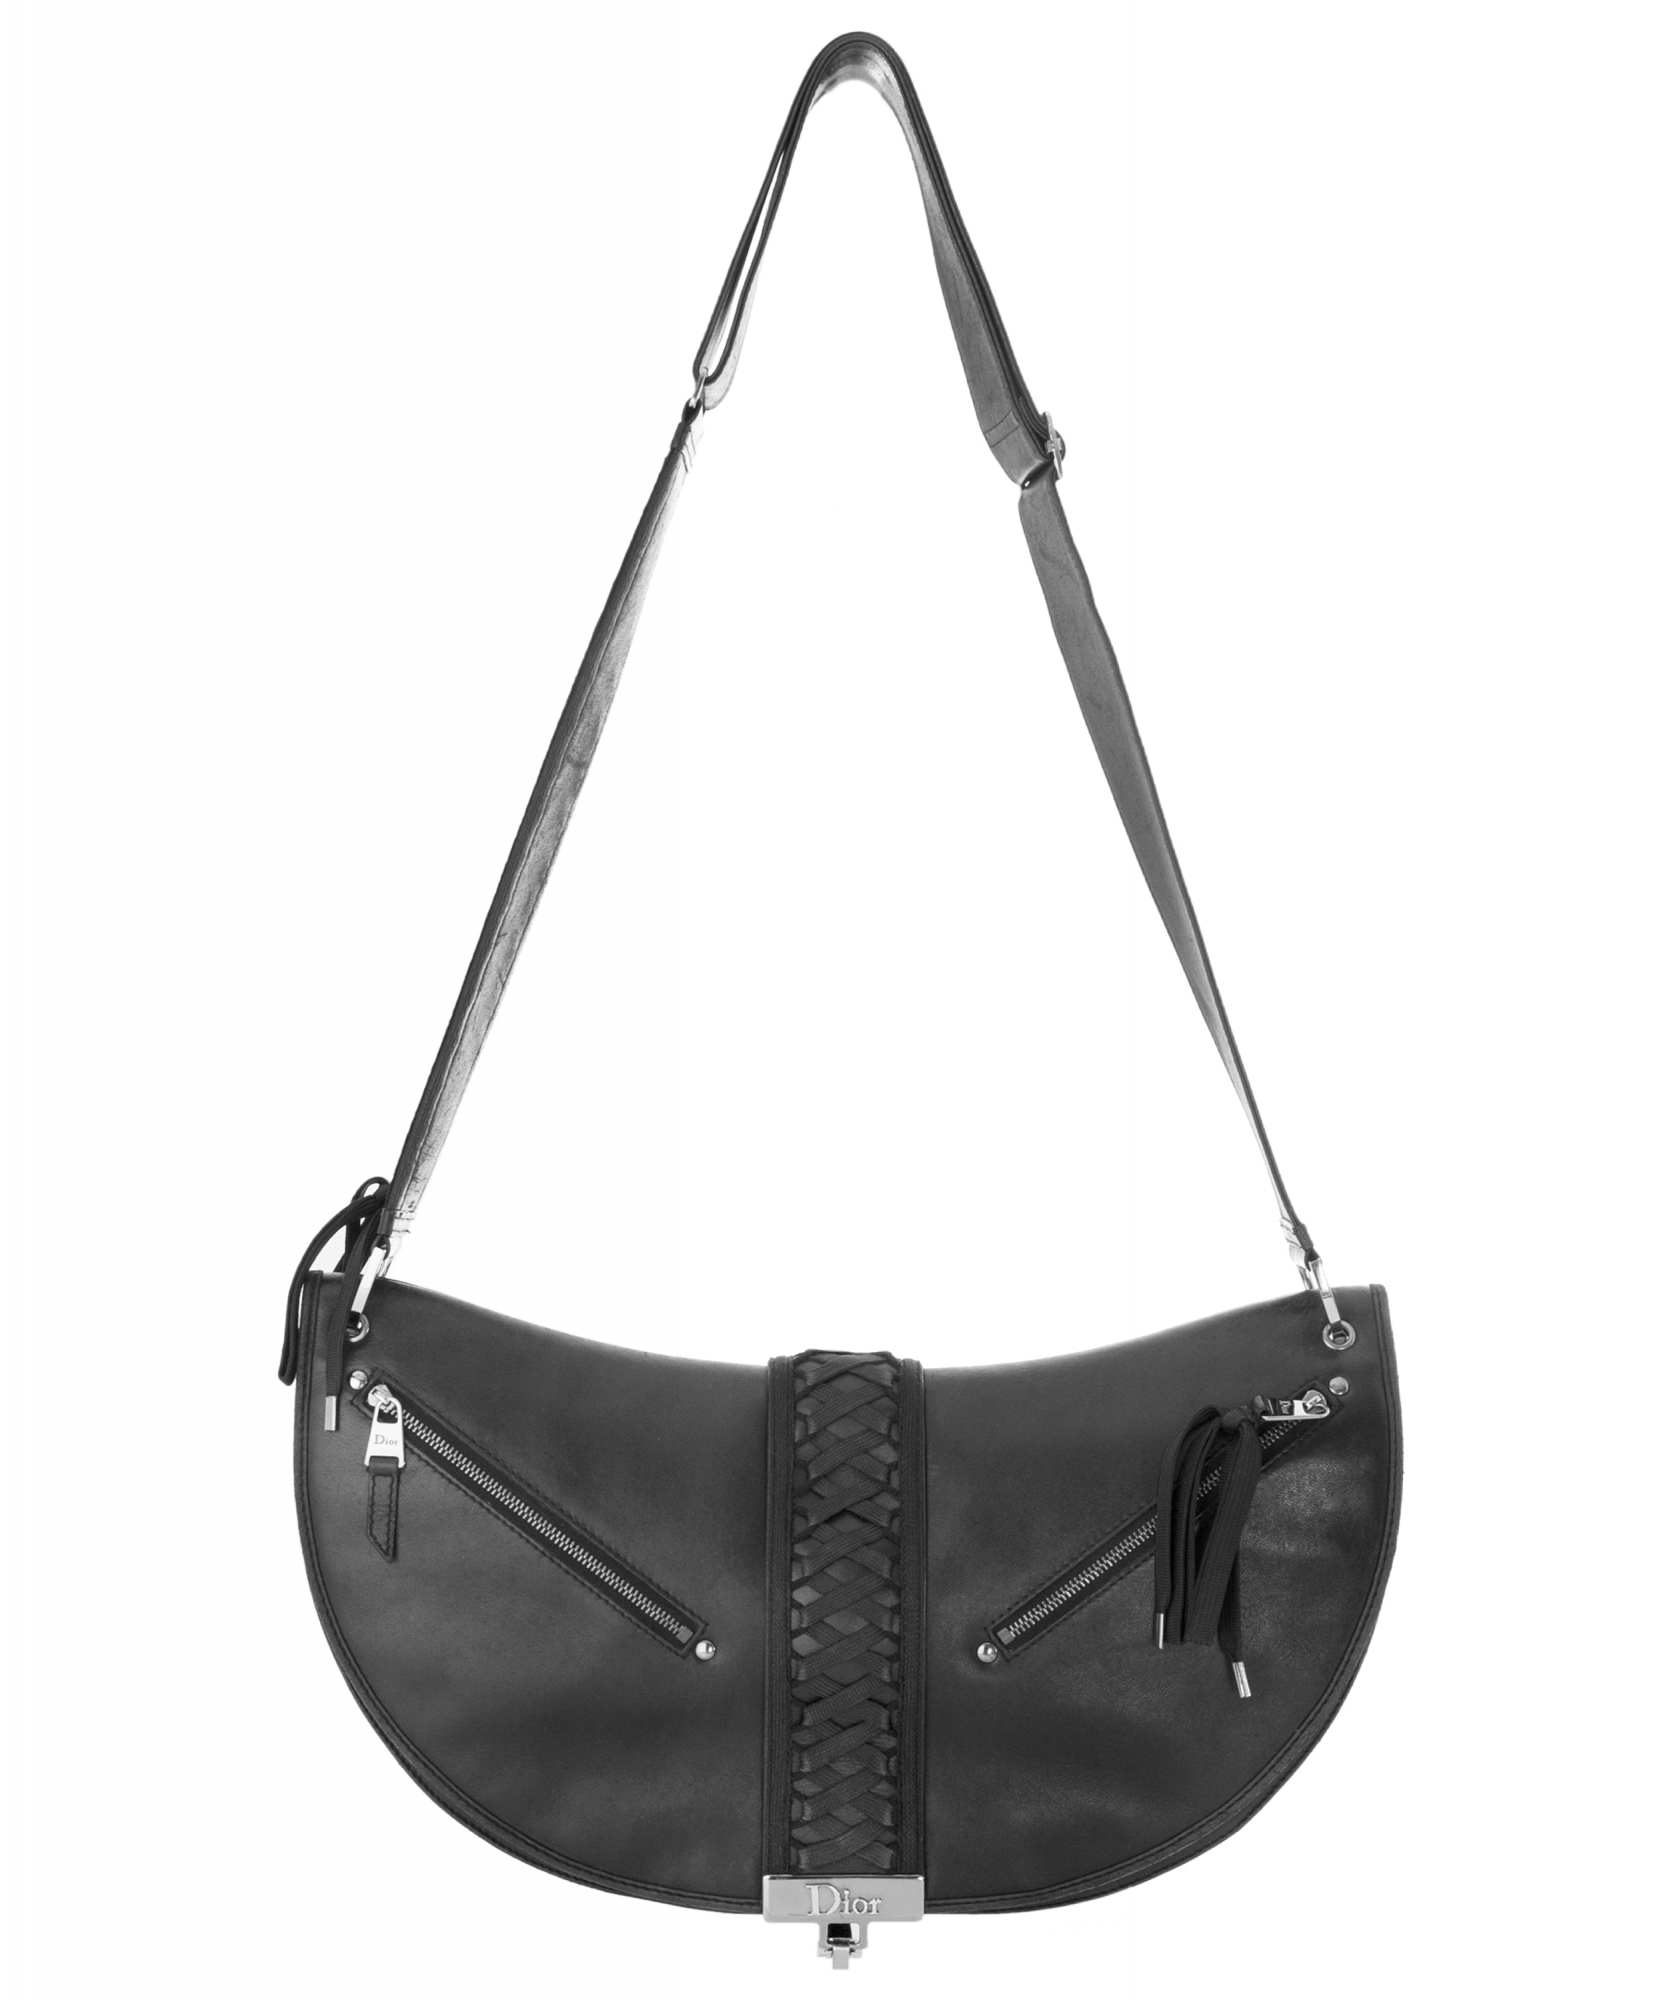 Christian Dior  Admit It  Black Leather Hobo Shoulder Bag  9dfc0b5e0b6f2